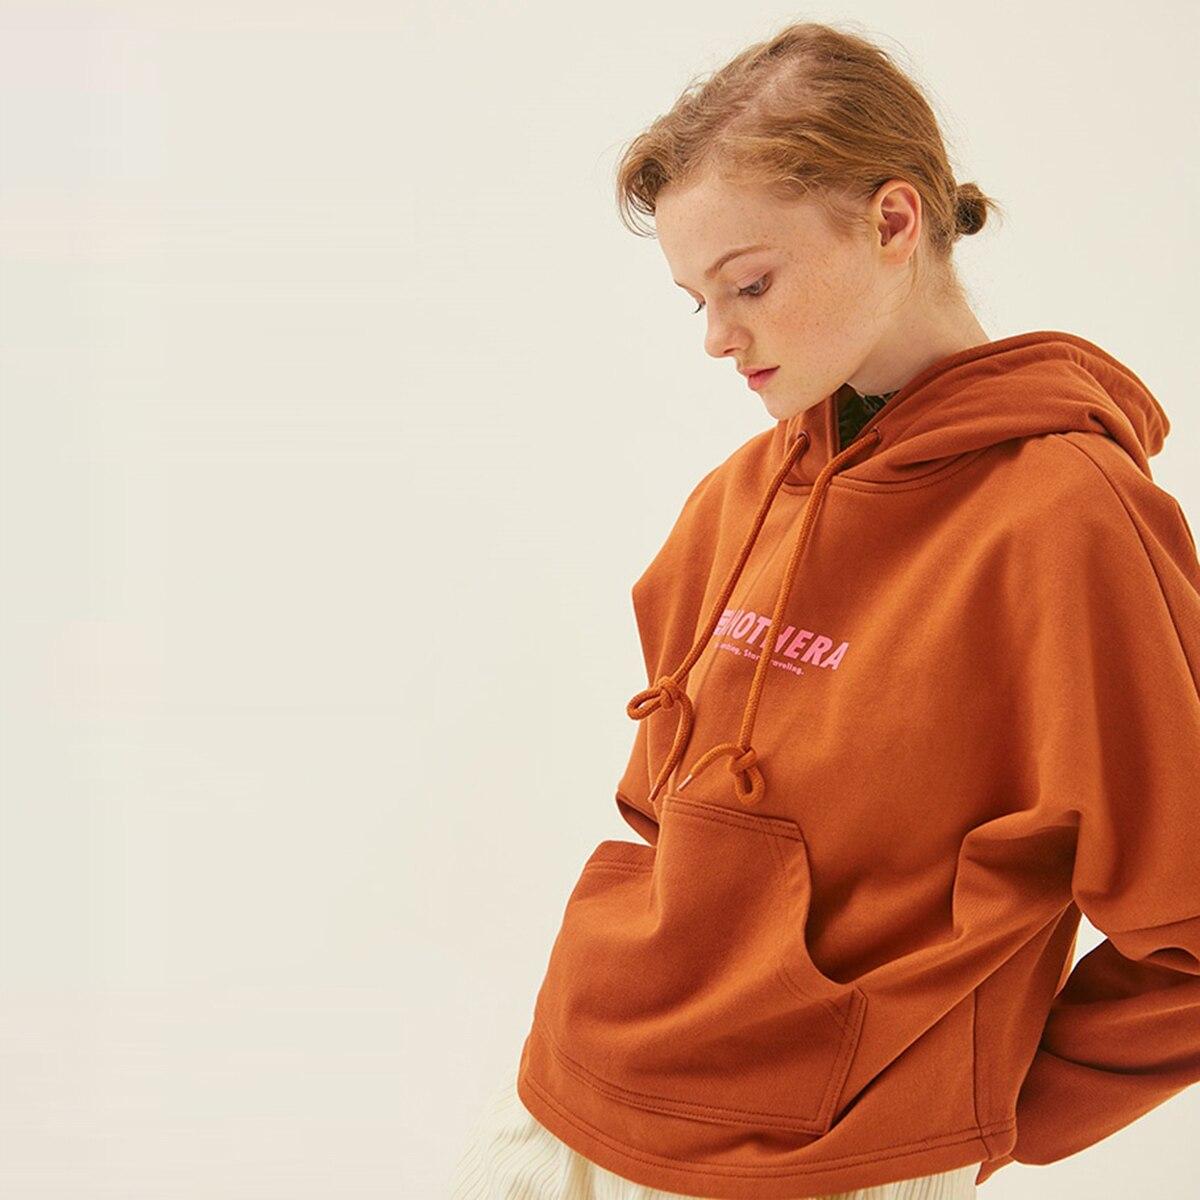 HYH HAOYIHUI Solid Color Sweatshirt Minimalist Solid Drop Shoulder Crop Letter Hoodie Autumn Casual Pullovers in Hoodies amp Sweatshirts from Women 39 s Clothing